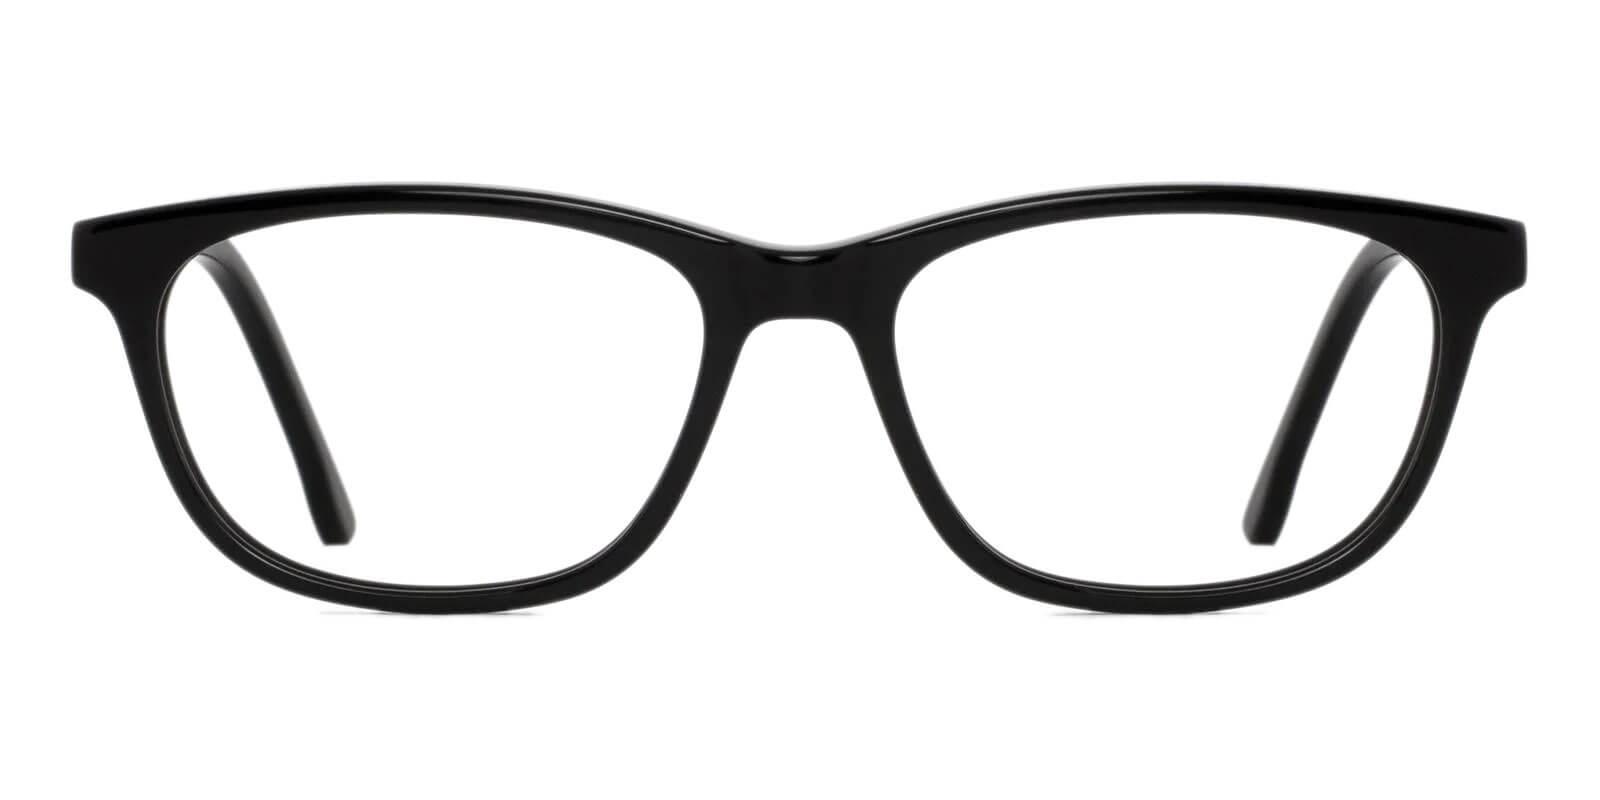 Machovec Black Acetate Eyeglasses , SpringHinges , UniversalBridgeFit Frames from ABBE Glasses